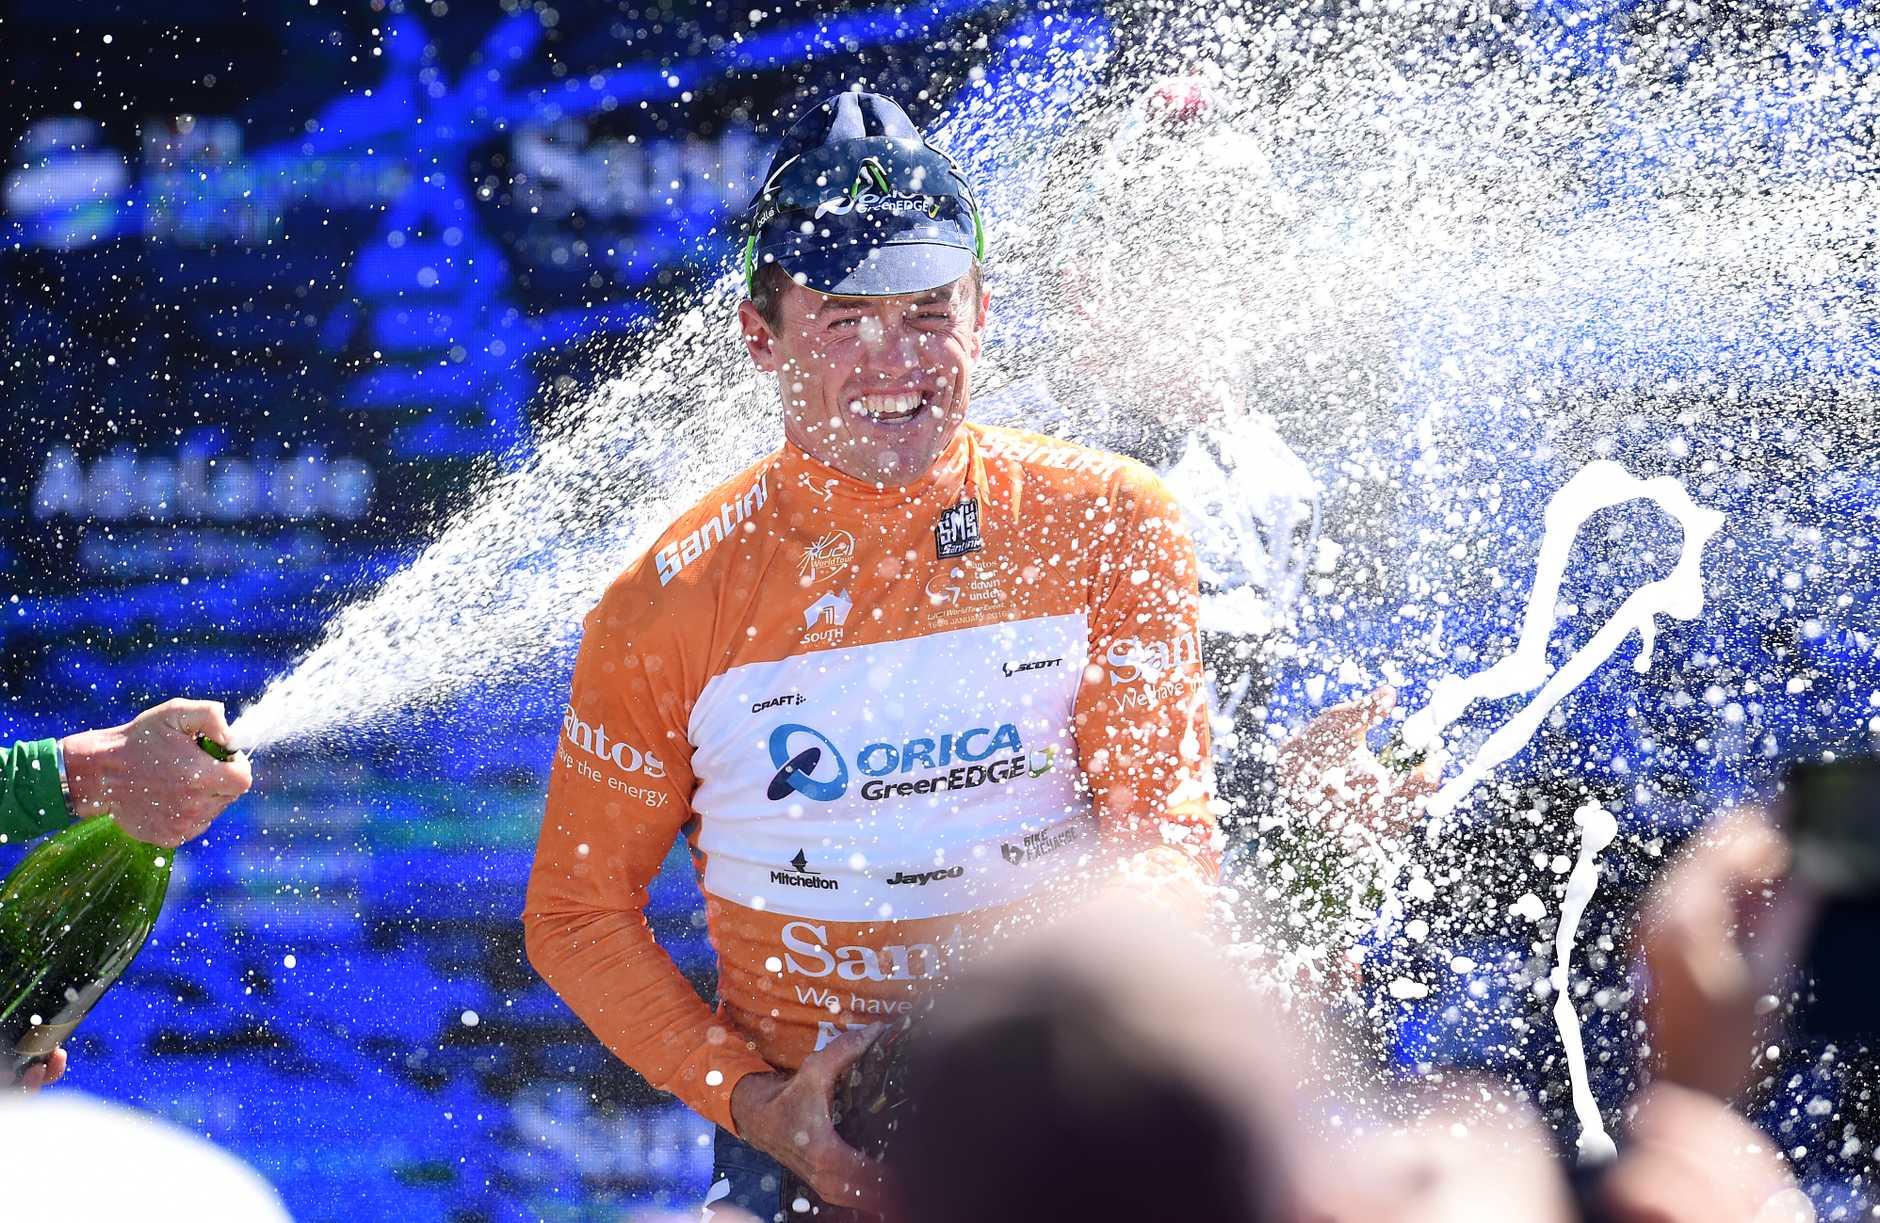 Simon Gerrans celebrates his win yesterday in Adelaide. Photo: AAP Image.